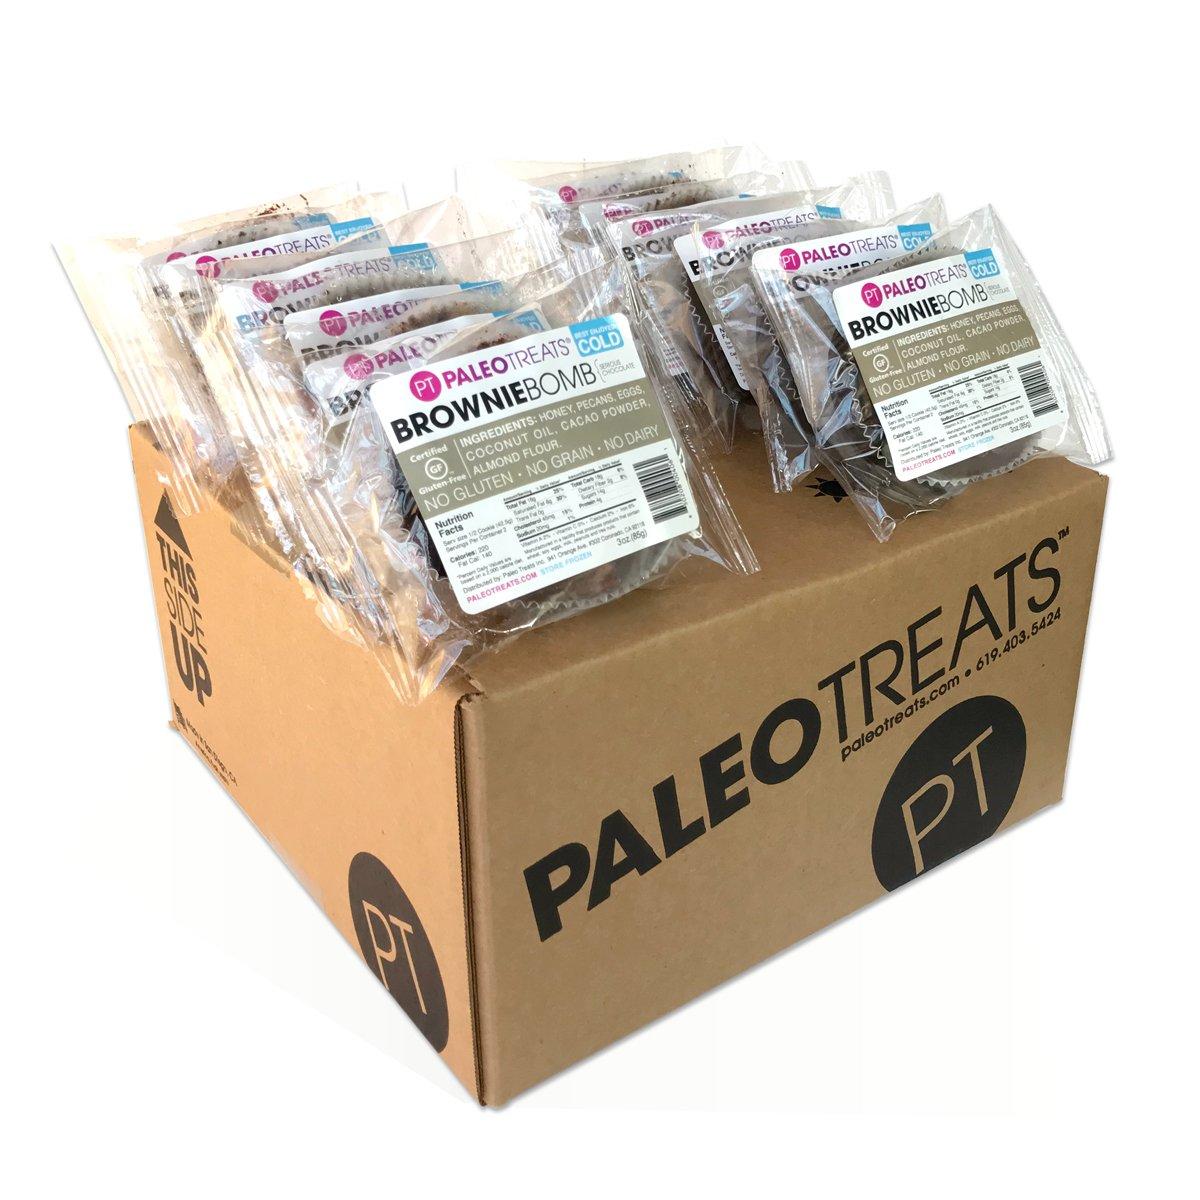 Paleo Treats Brownie Bomb: Paleo cookie, Gluten-Free, Grain-Free, Dairy-Free, Soy-Free, Real Food Dessert (Box of 12)